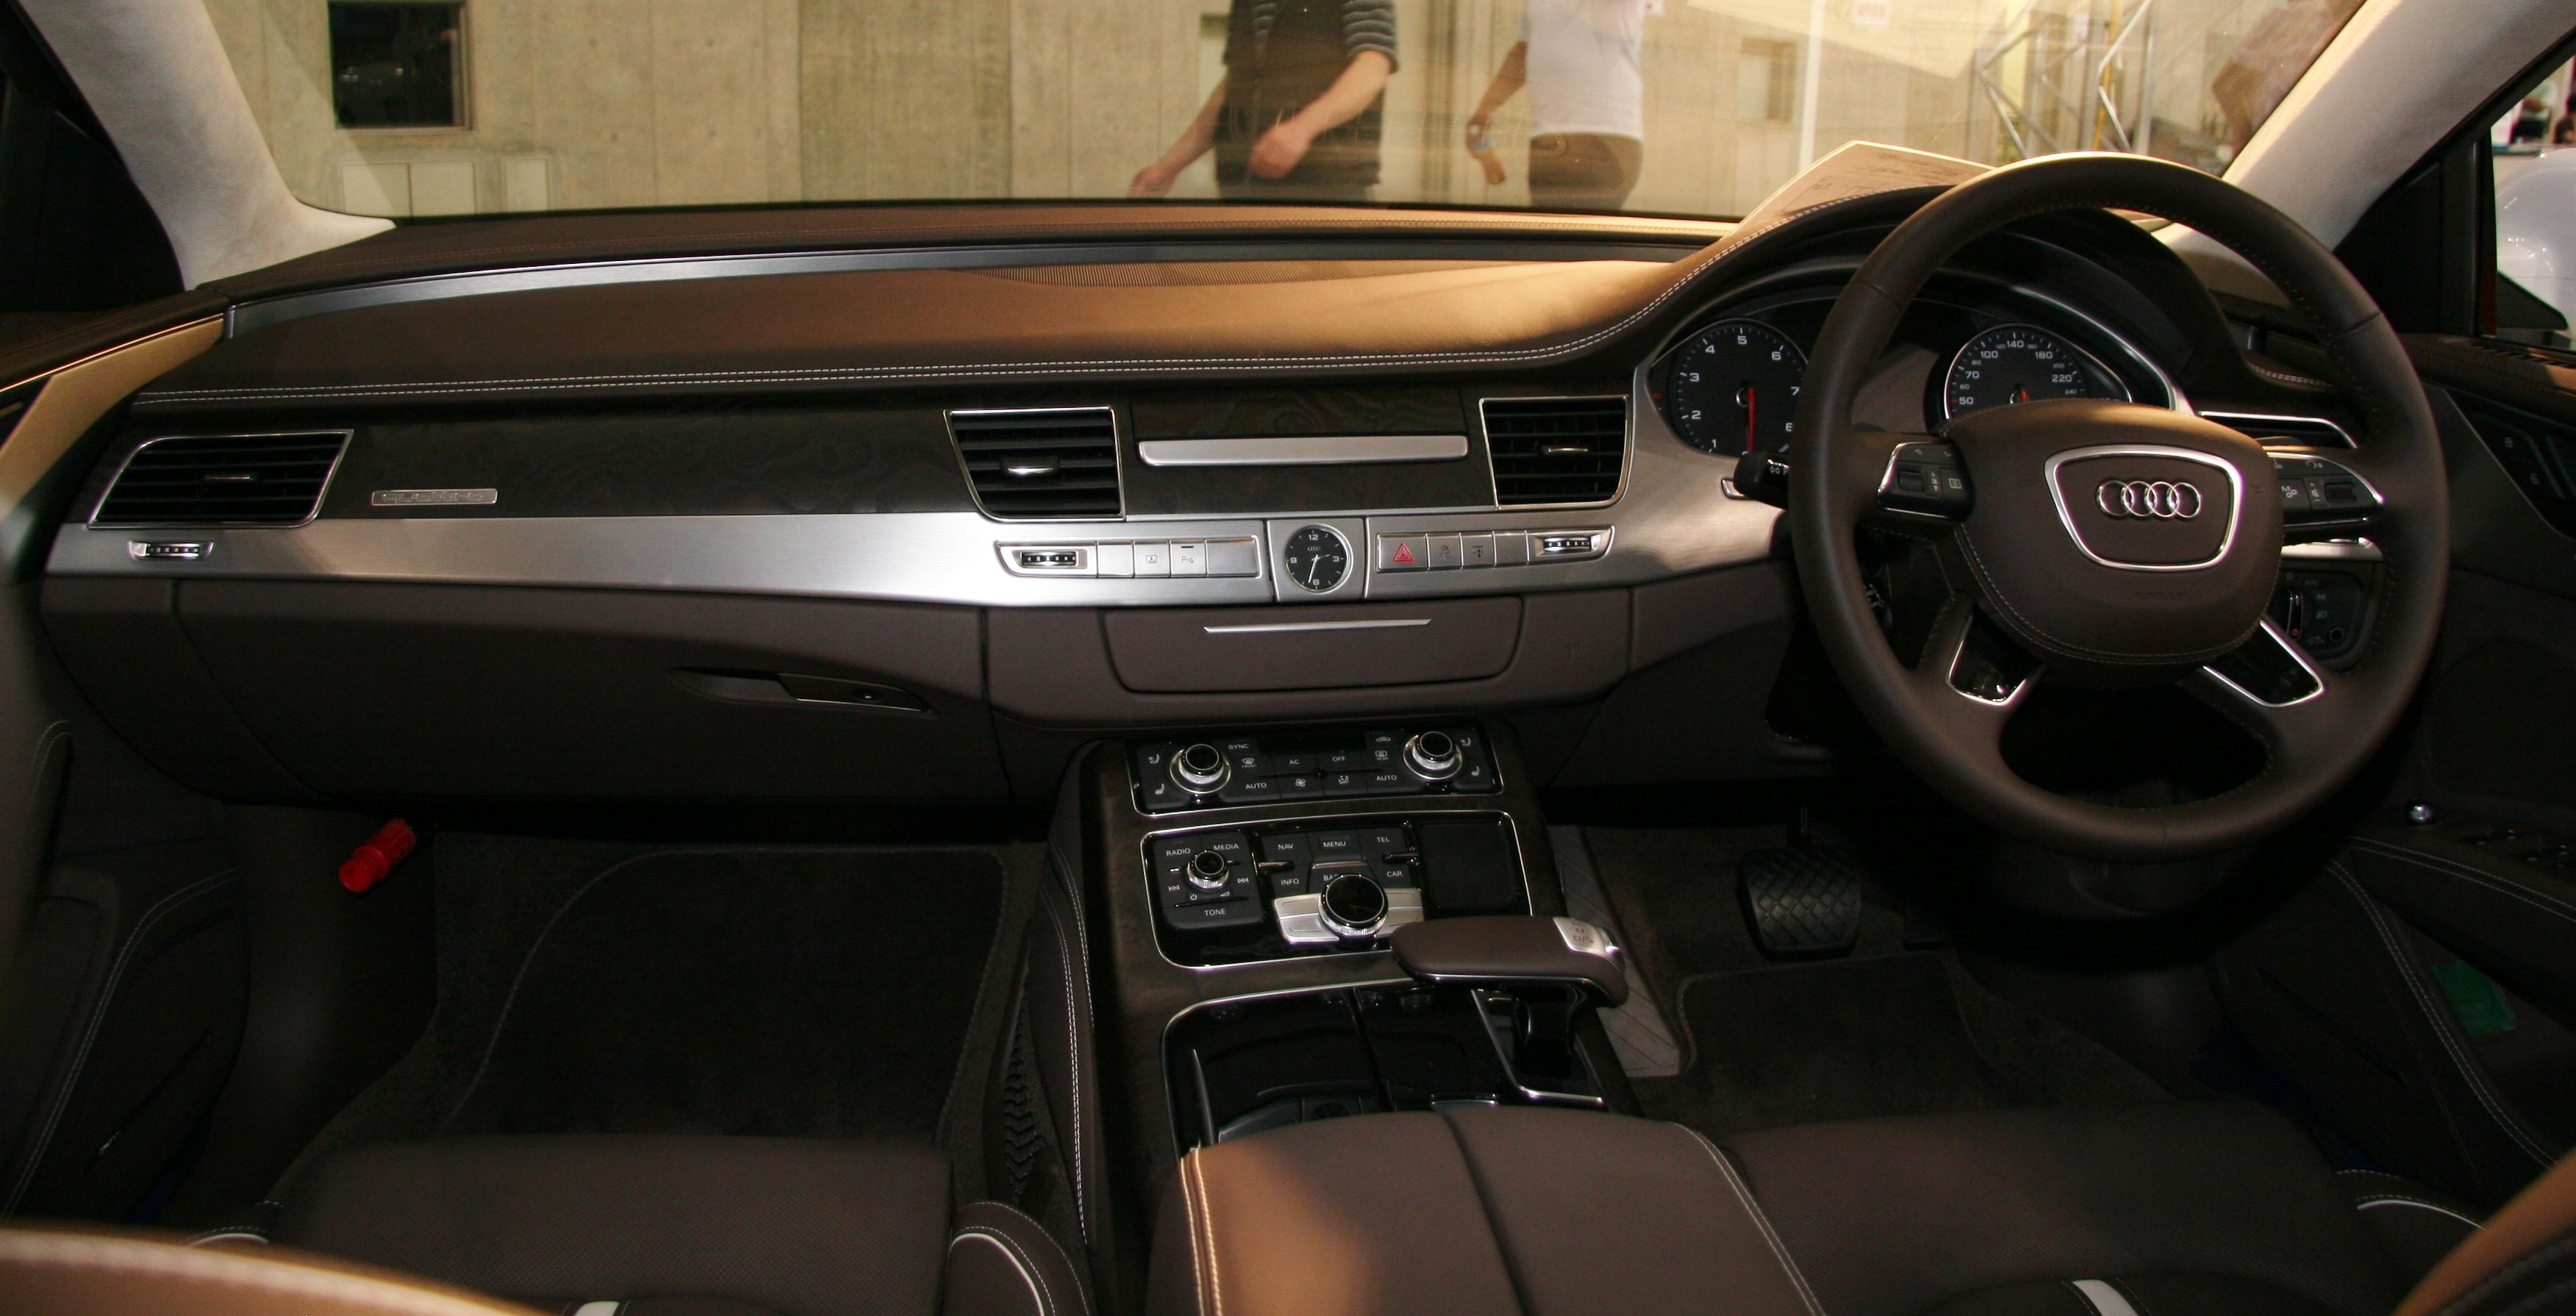 File Audi A8 D4 Interior Jpg Wikimedia Commons